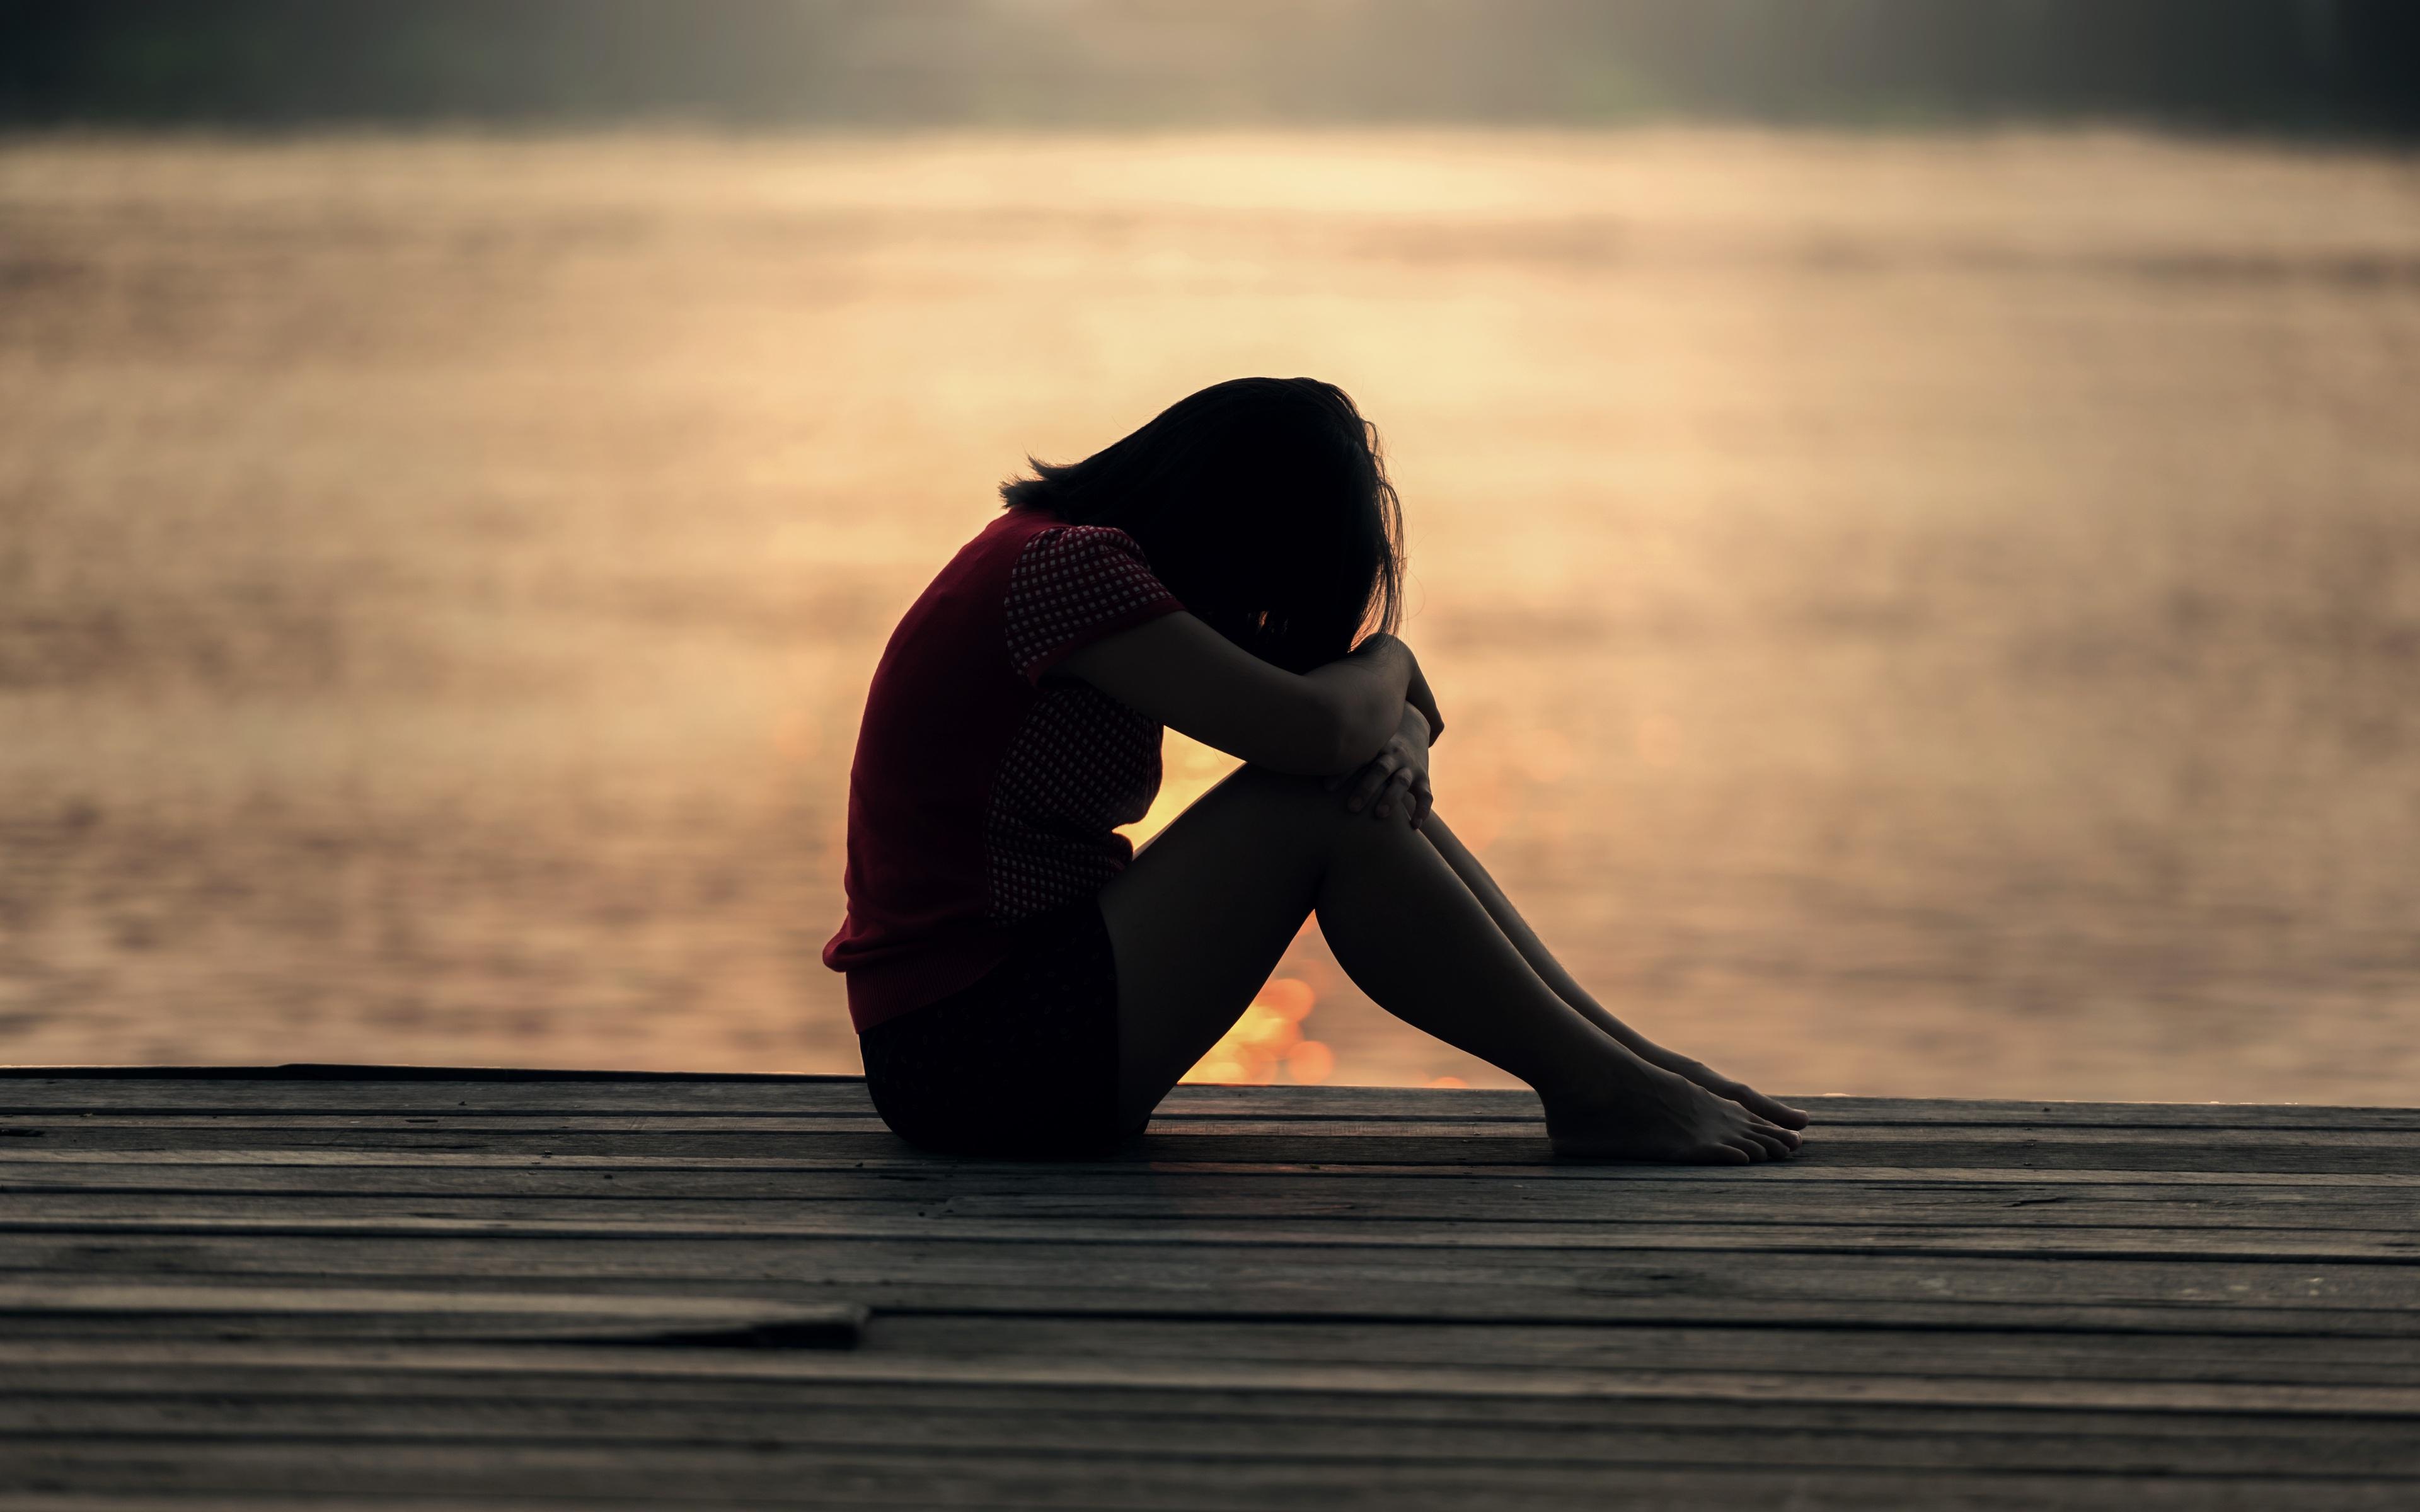 sad-girl-sitting-on-dock-silhouette-nb.jpg